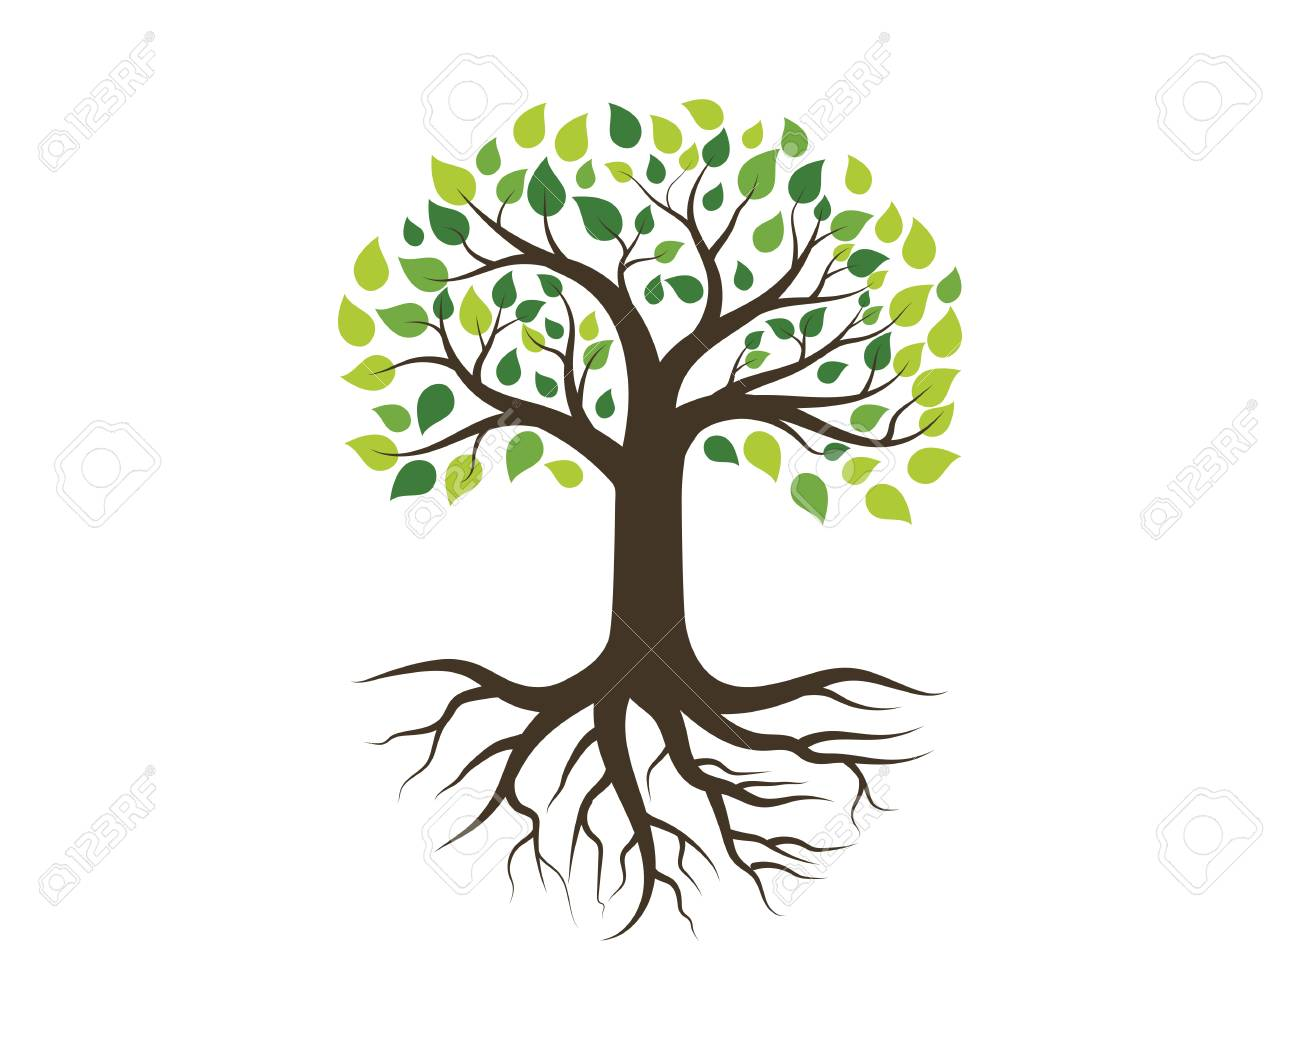 Tree icon template vector illustration design - 99333989